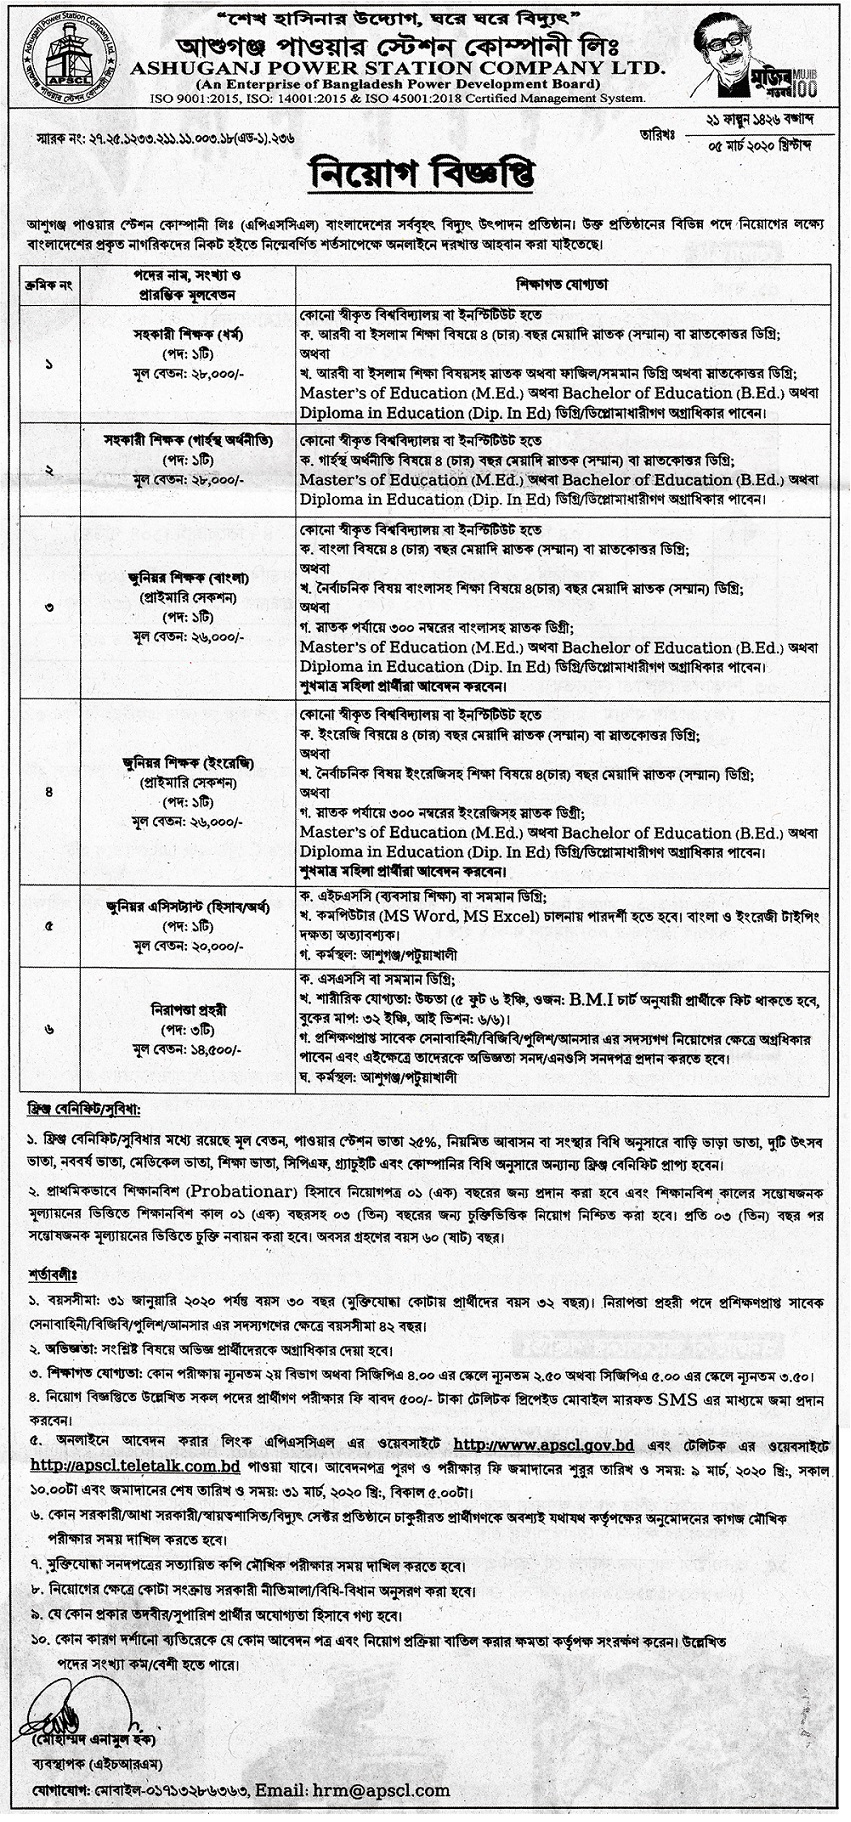 Ashuganj Power Station Company Ltd Job Circular 2020